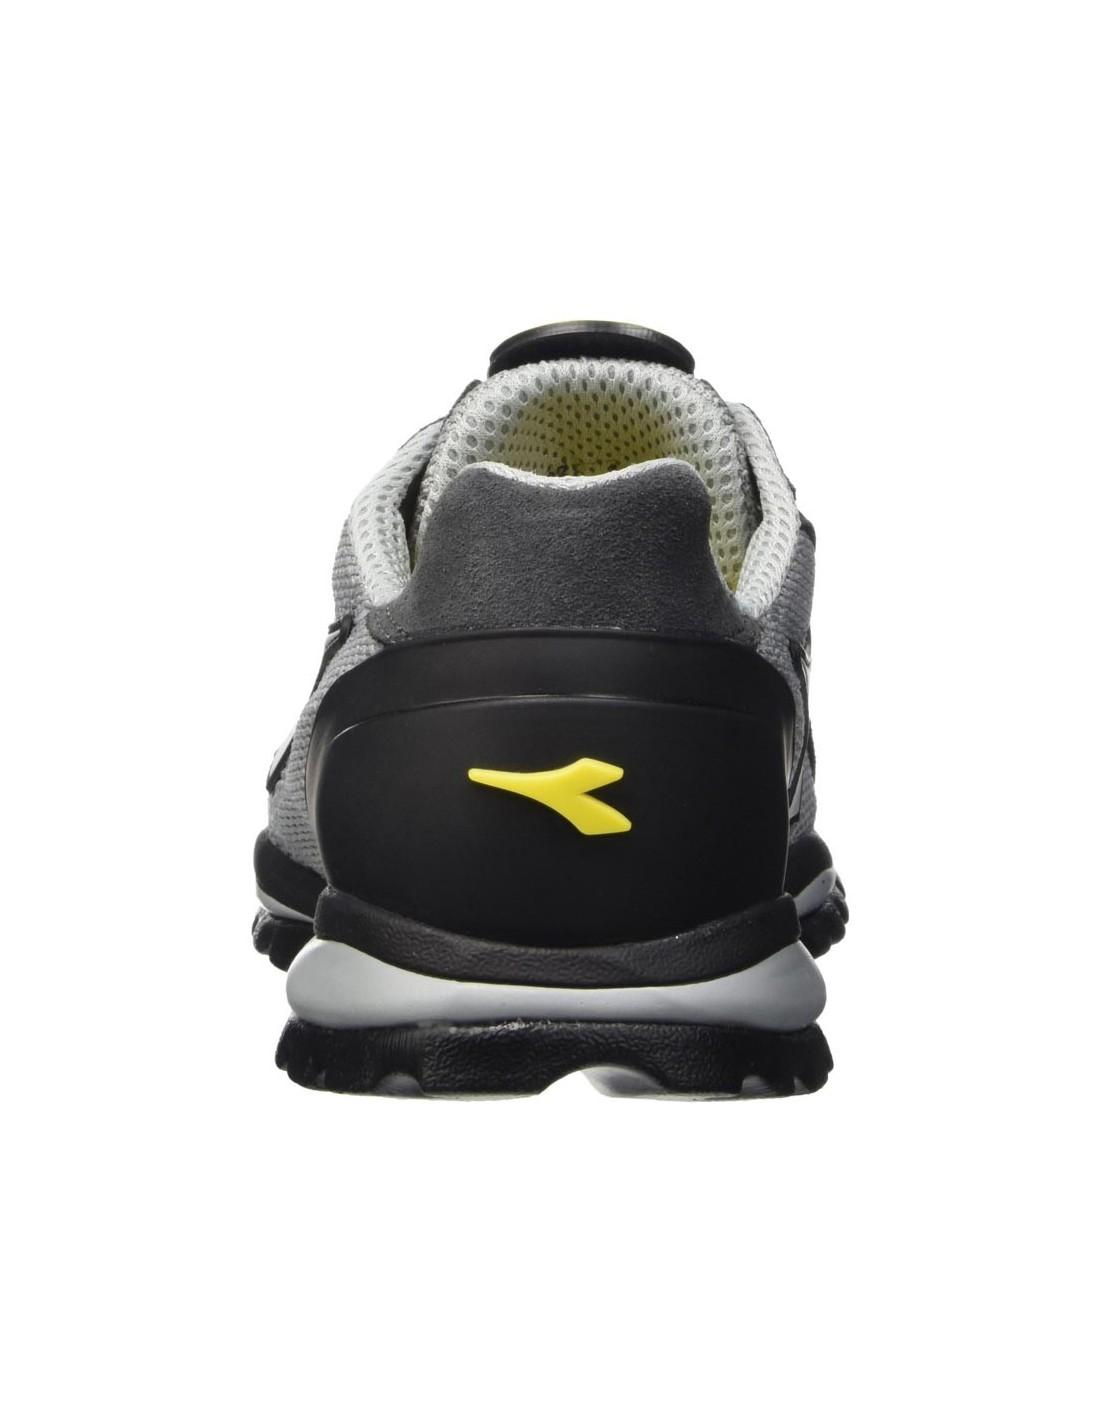 Nike Scarpa Scarpa Antinfortunistica Nike Scarpa Scarpa Antinfortunistica Antinfortunistica Antinfortunistica Nike Y0anXx0Aw